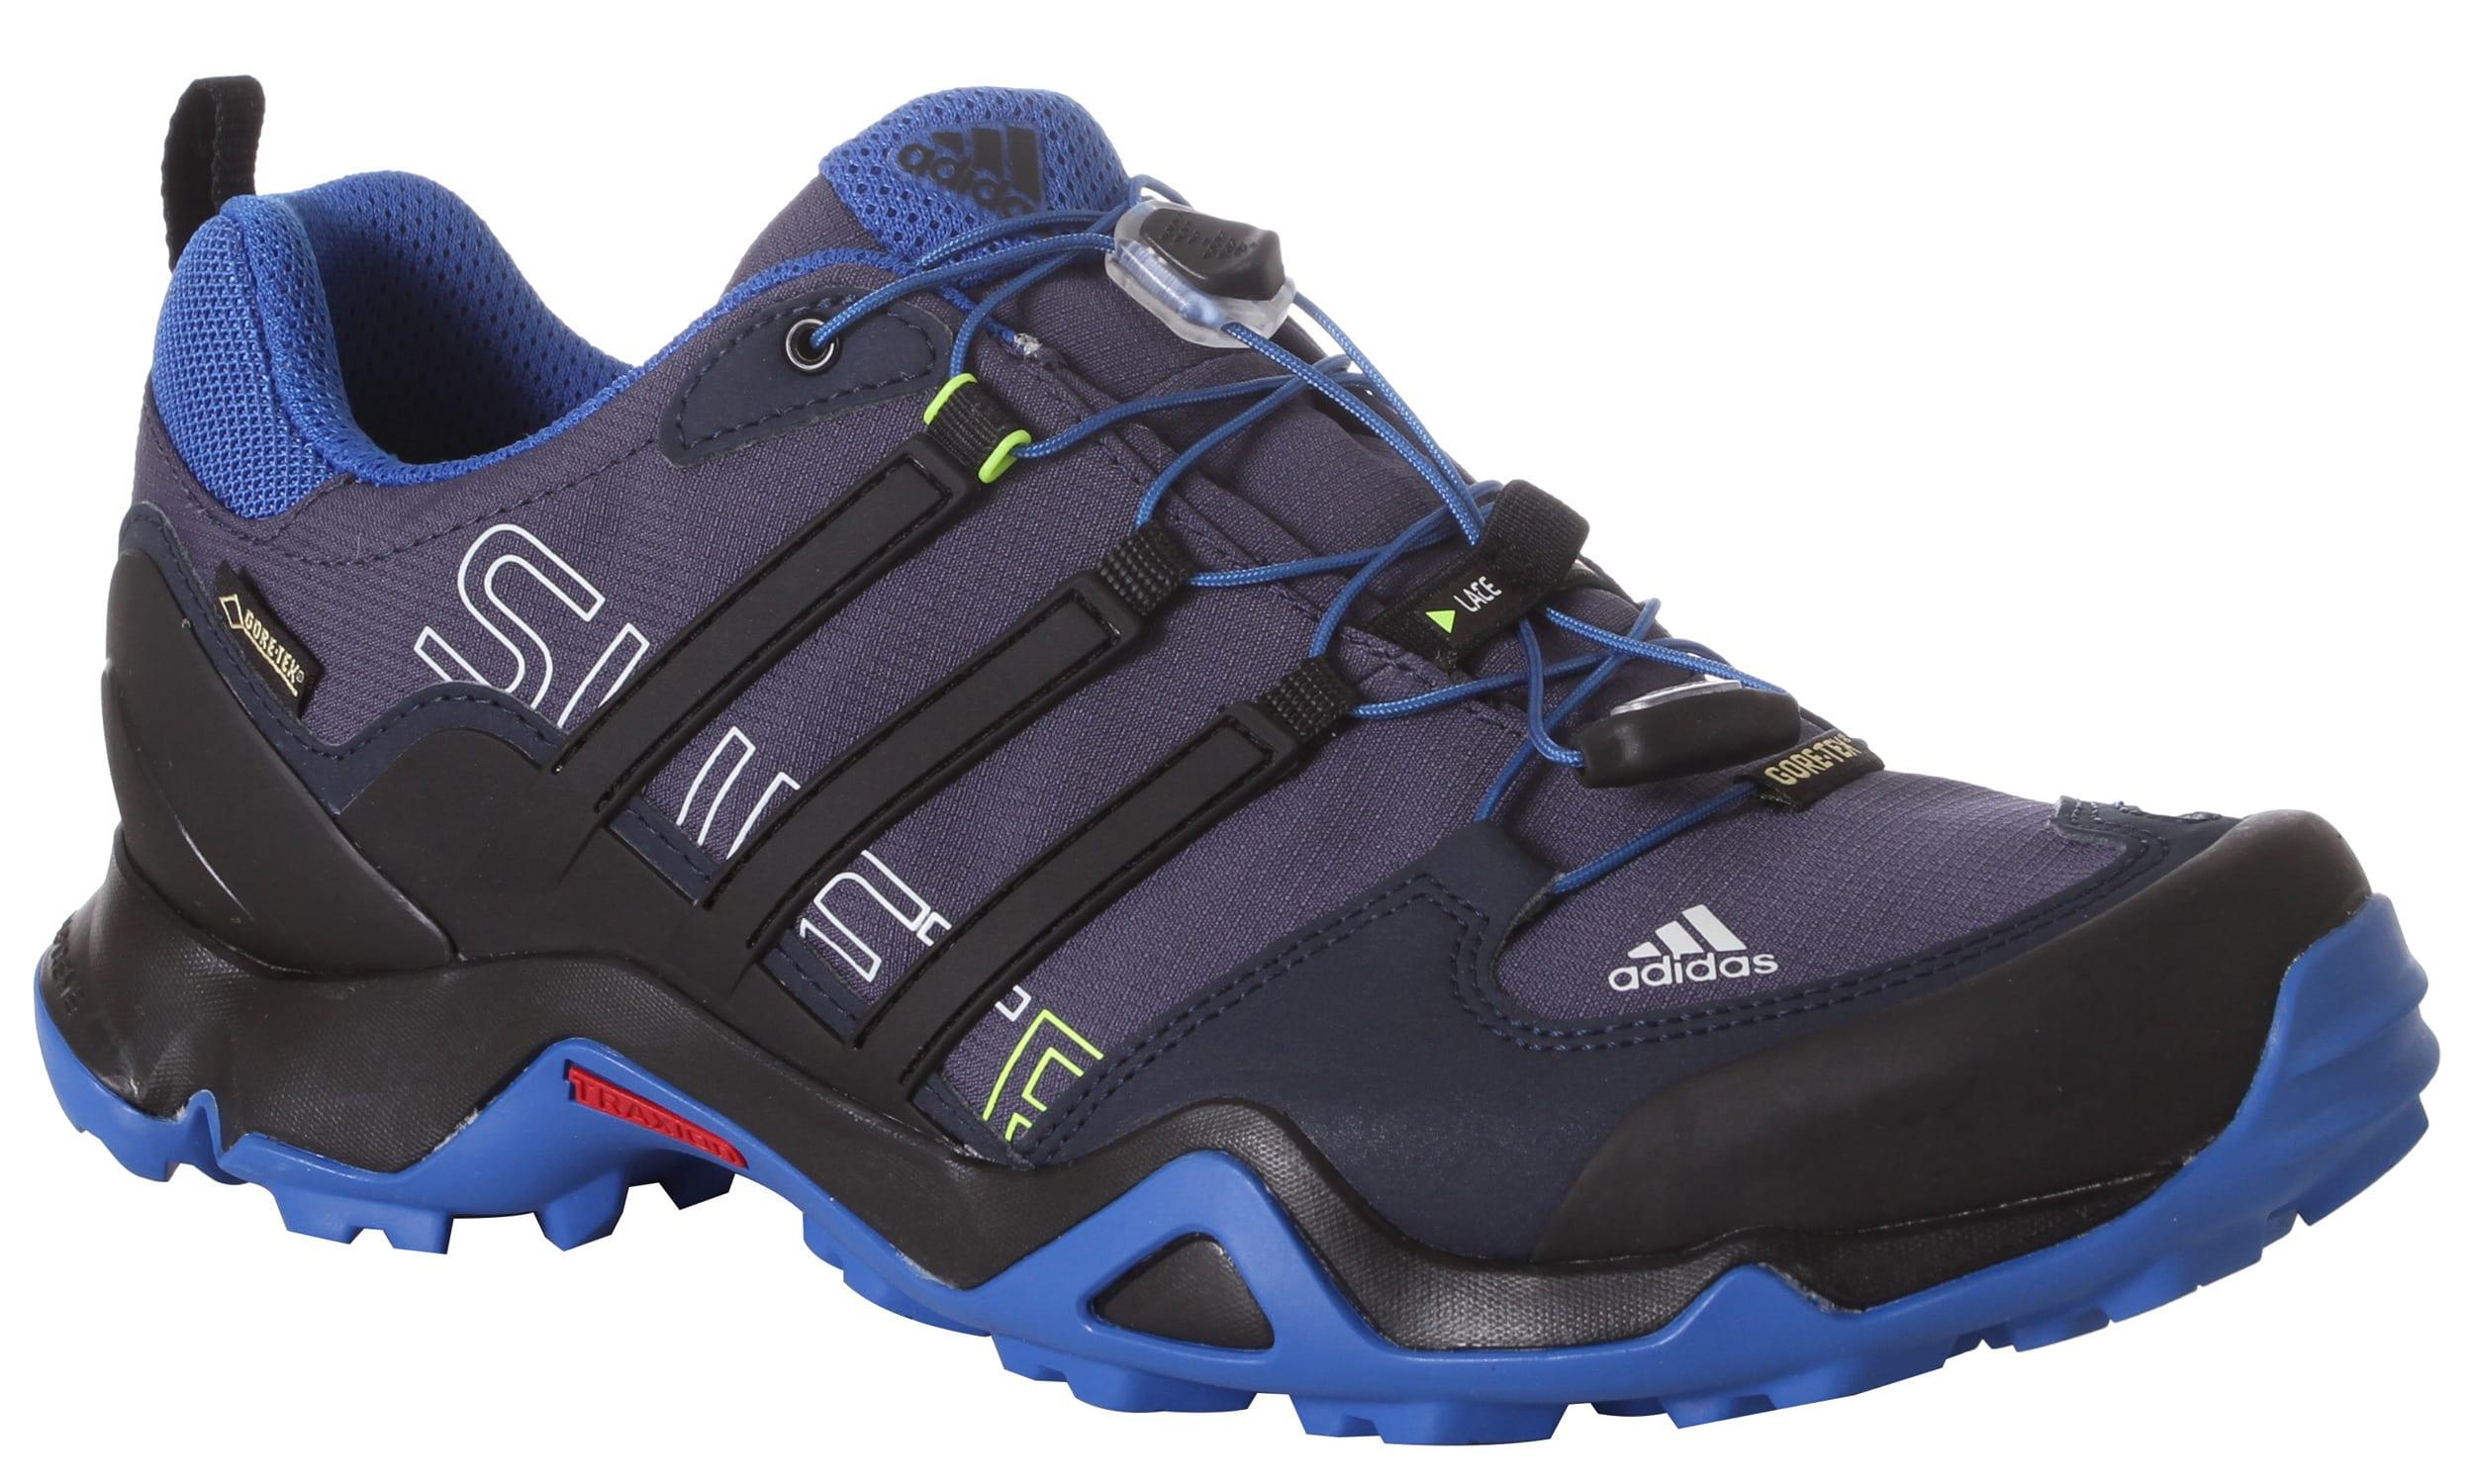 online store 93537 73a60 Adidas Terrex Swift R GTX Hiking Shoes - thumbnail 2